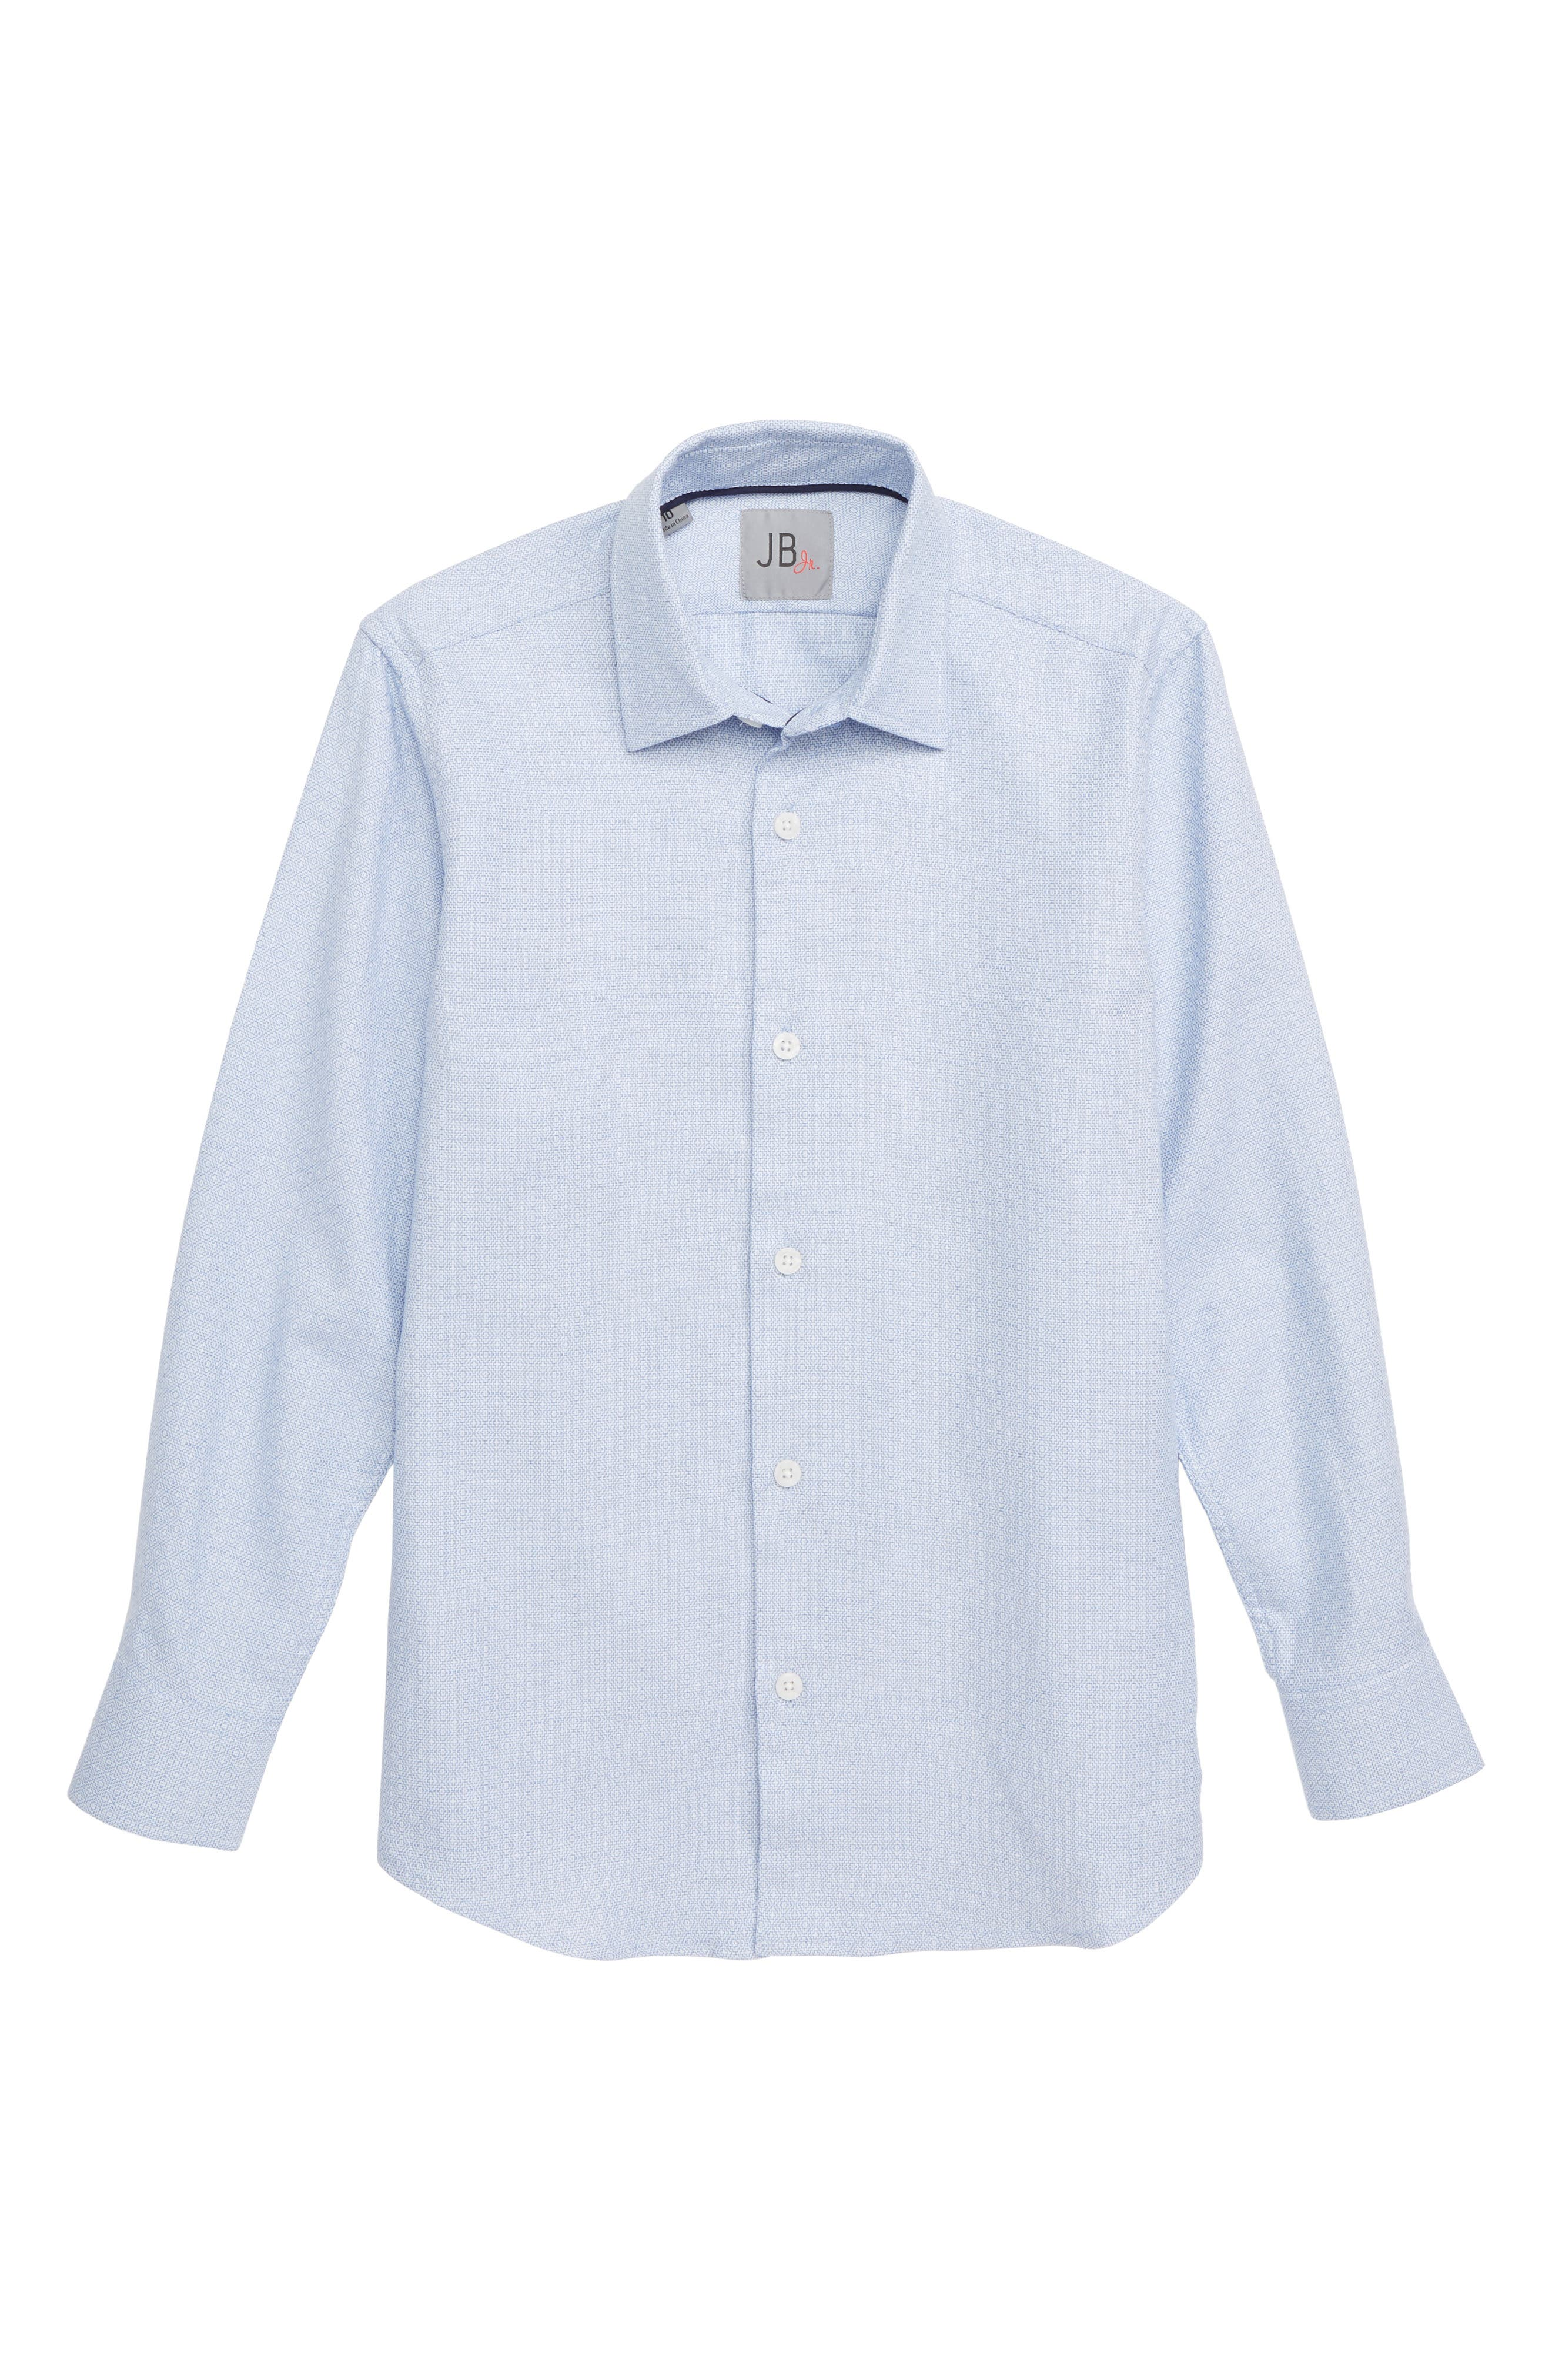 Tile Pattern Dress Shirt,                             Main thumbnail 1, color,                             BLUE